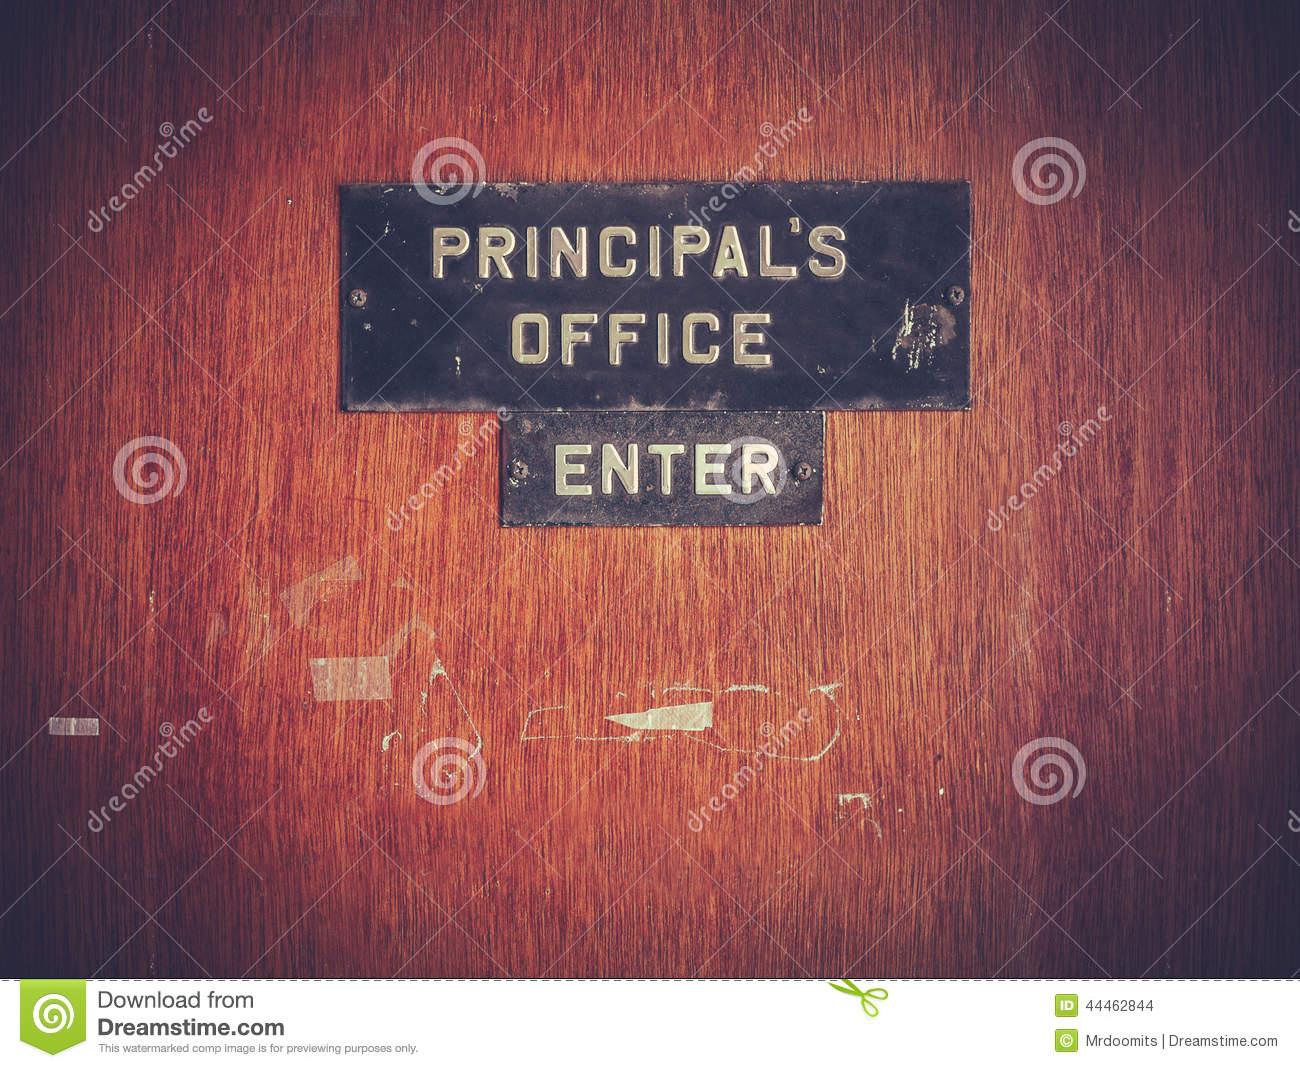 Office clipart principal office Door Clipart School For Principal